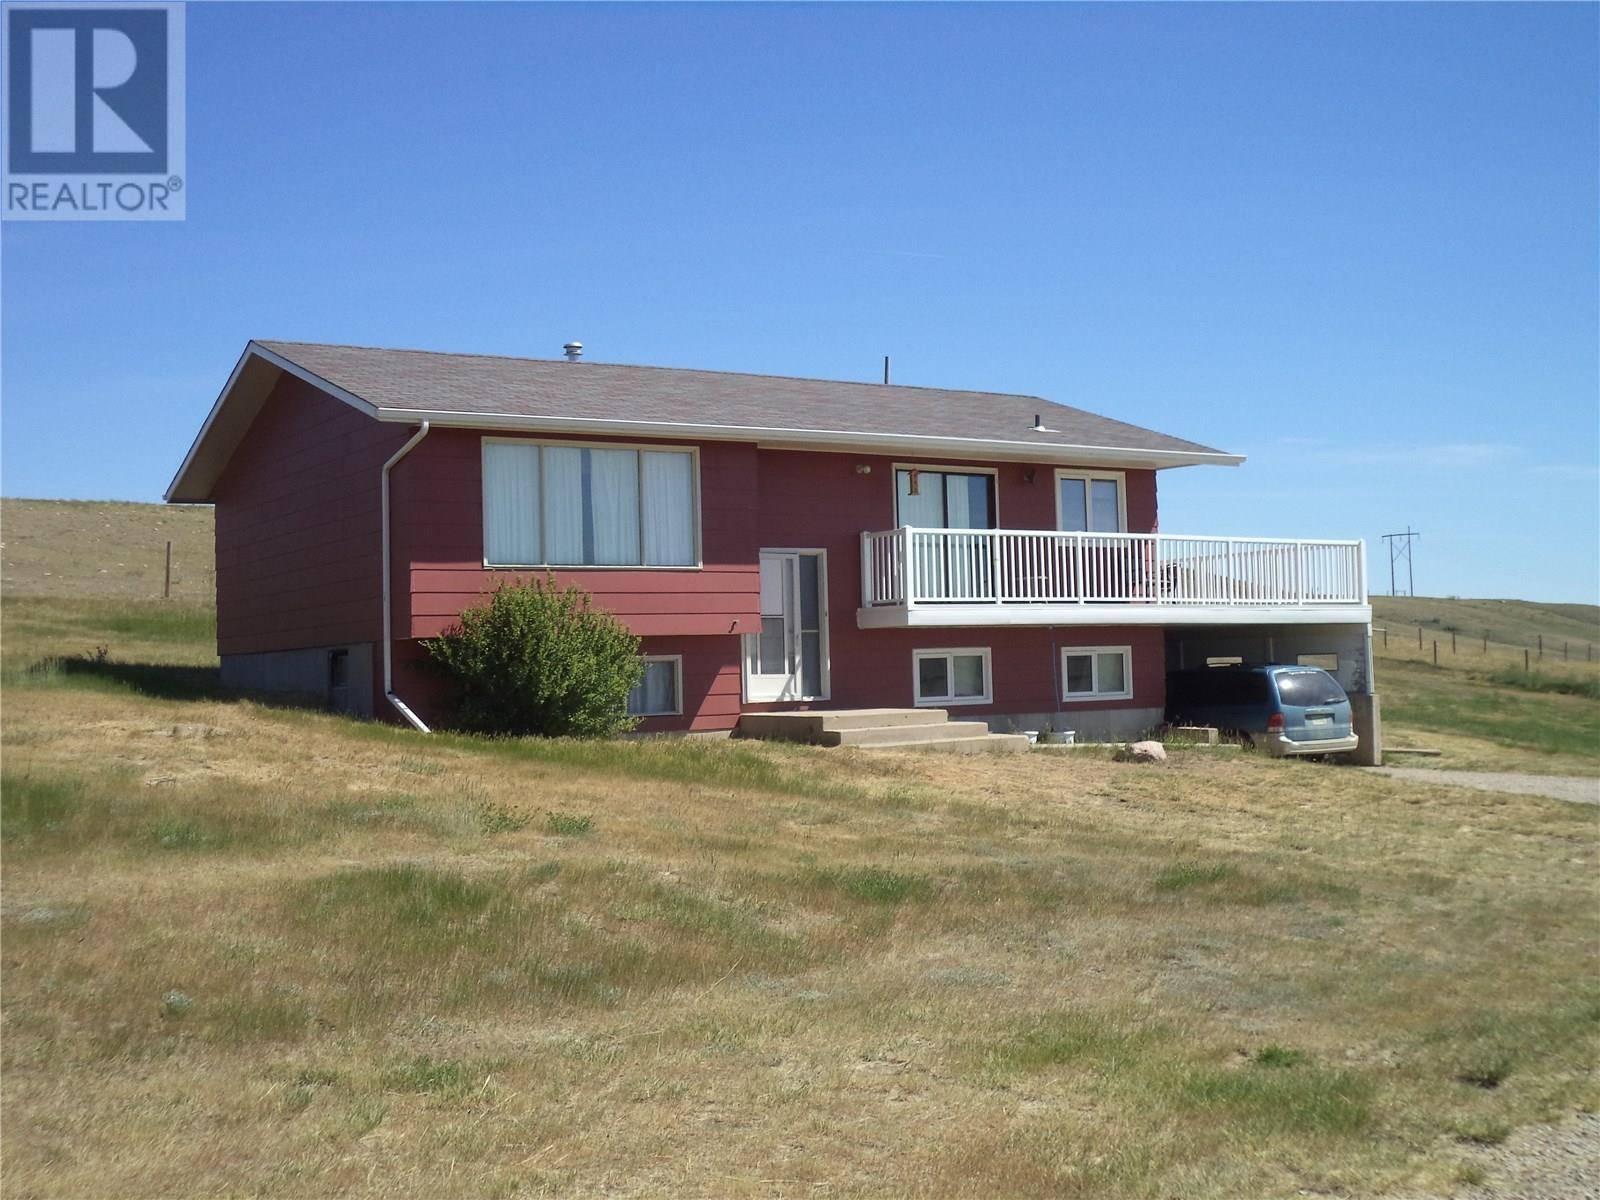 House for sale at  St. Cyr Acreage  Swift Current Rm No. 137 Saskatchewan - MLS: SK776137